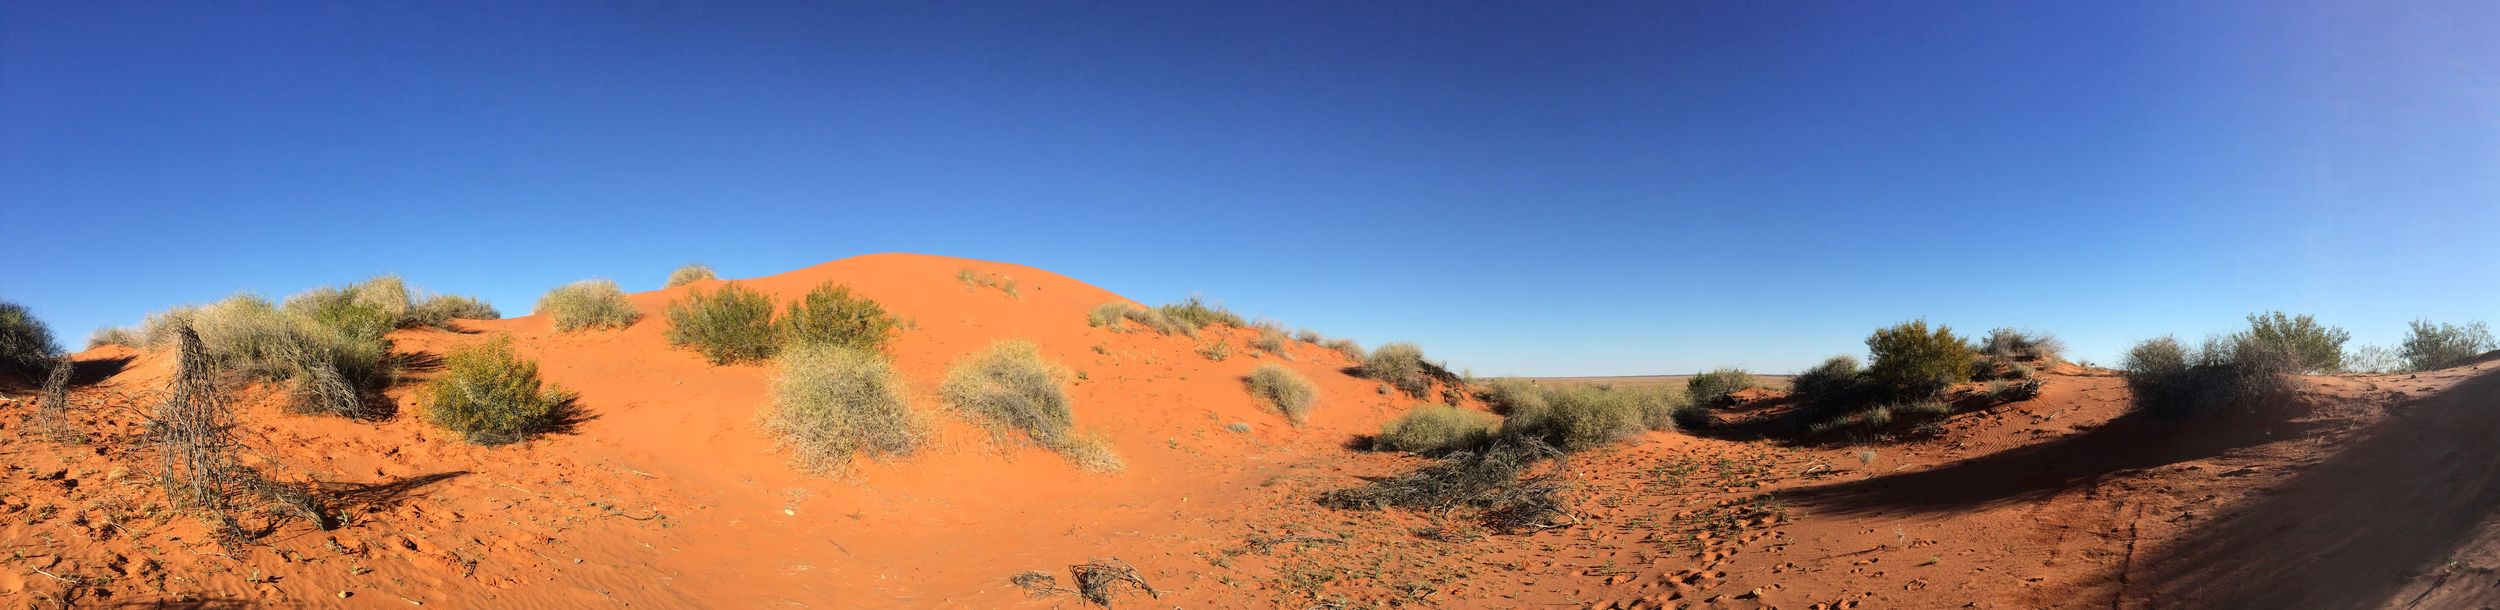 Vegetated sand dunes, Simpson Desert, NT